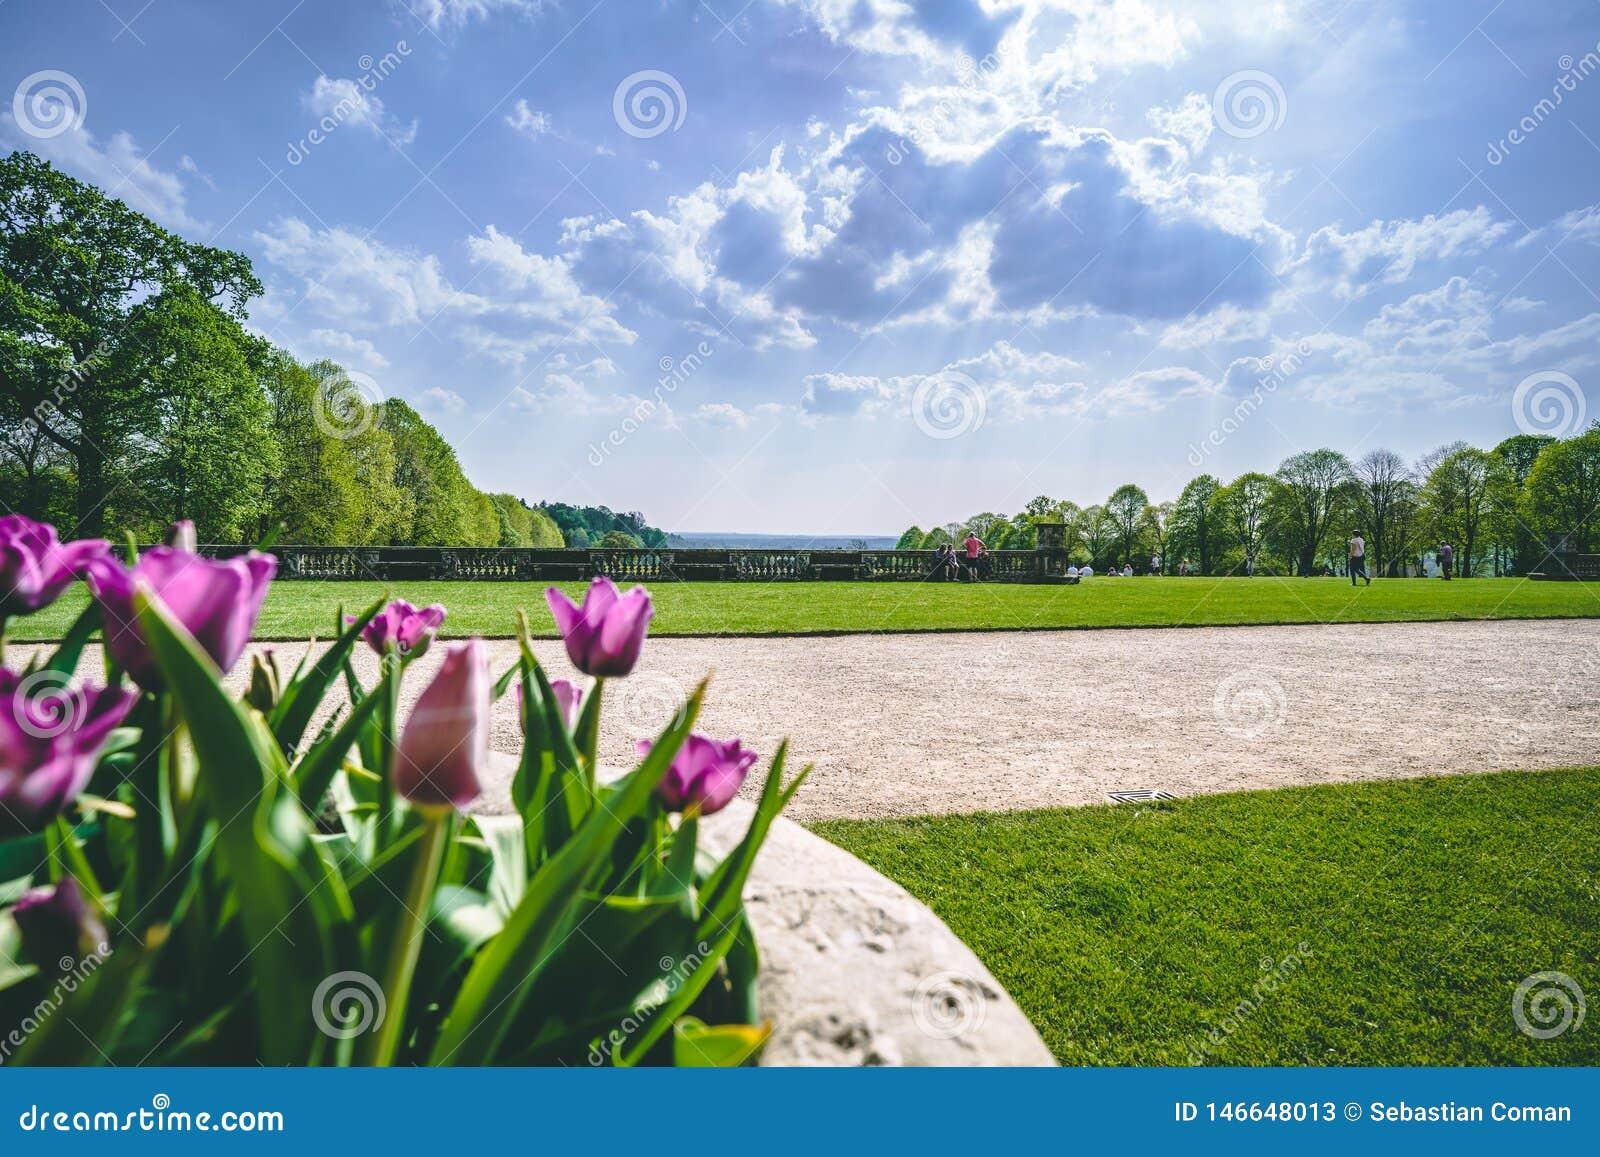 Opinião inglesa do jardim da mola com tulipas